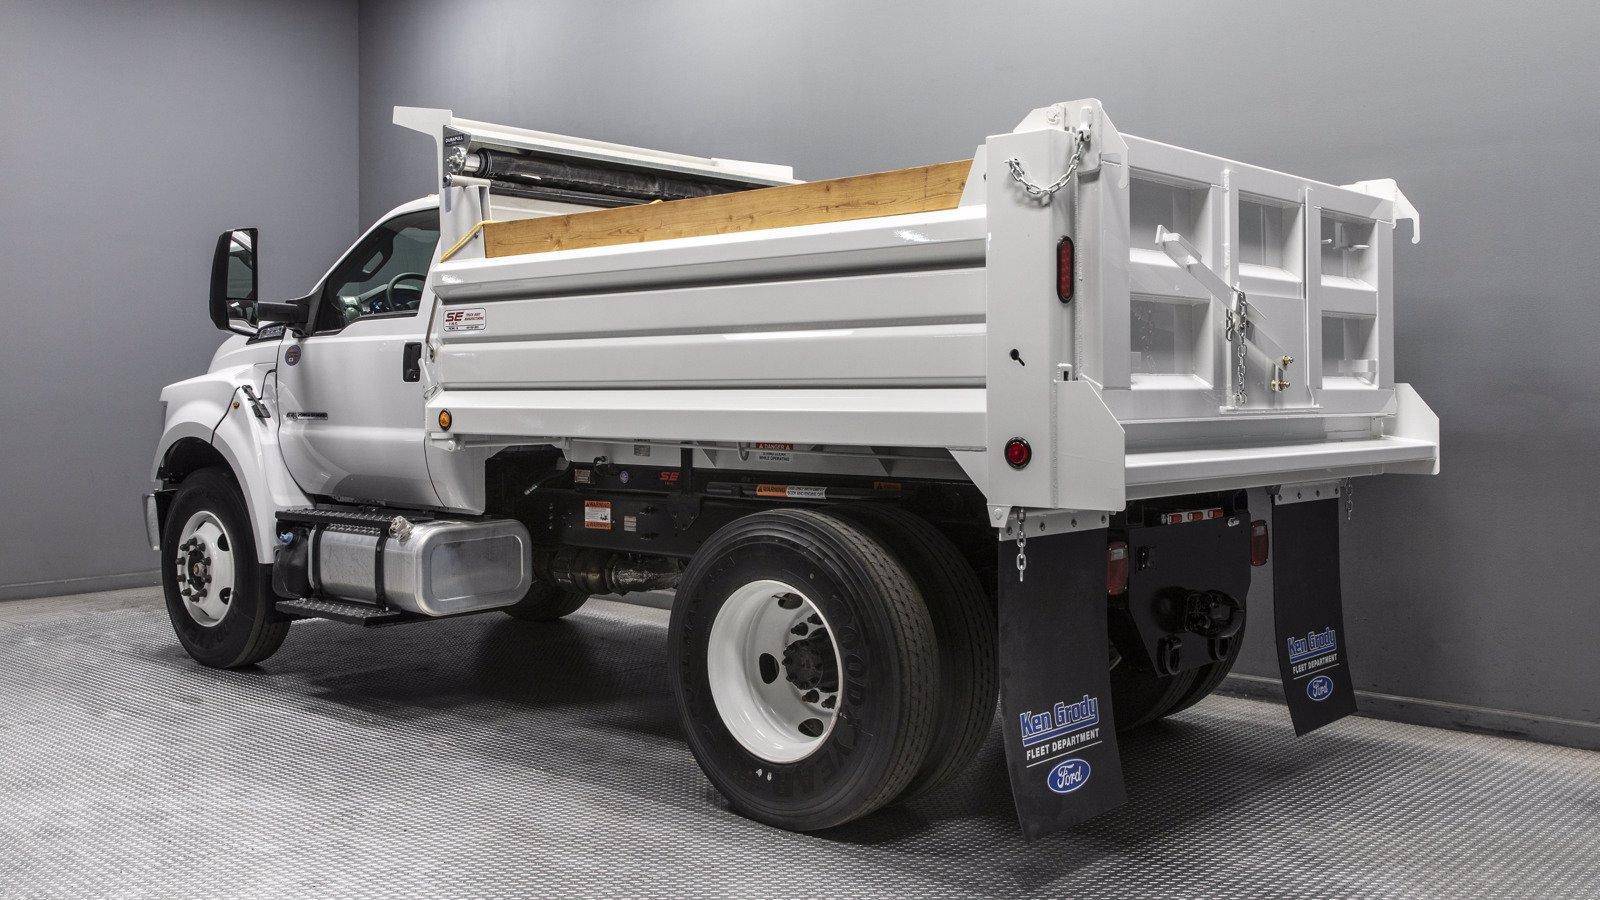 2021 Ford F-650 Regular Cab DRW 4x2, Scelzi Dump Body #210025 - photo 1